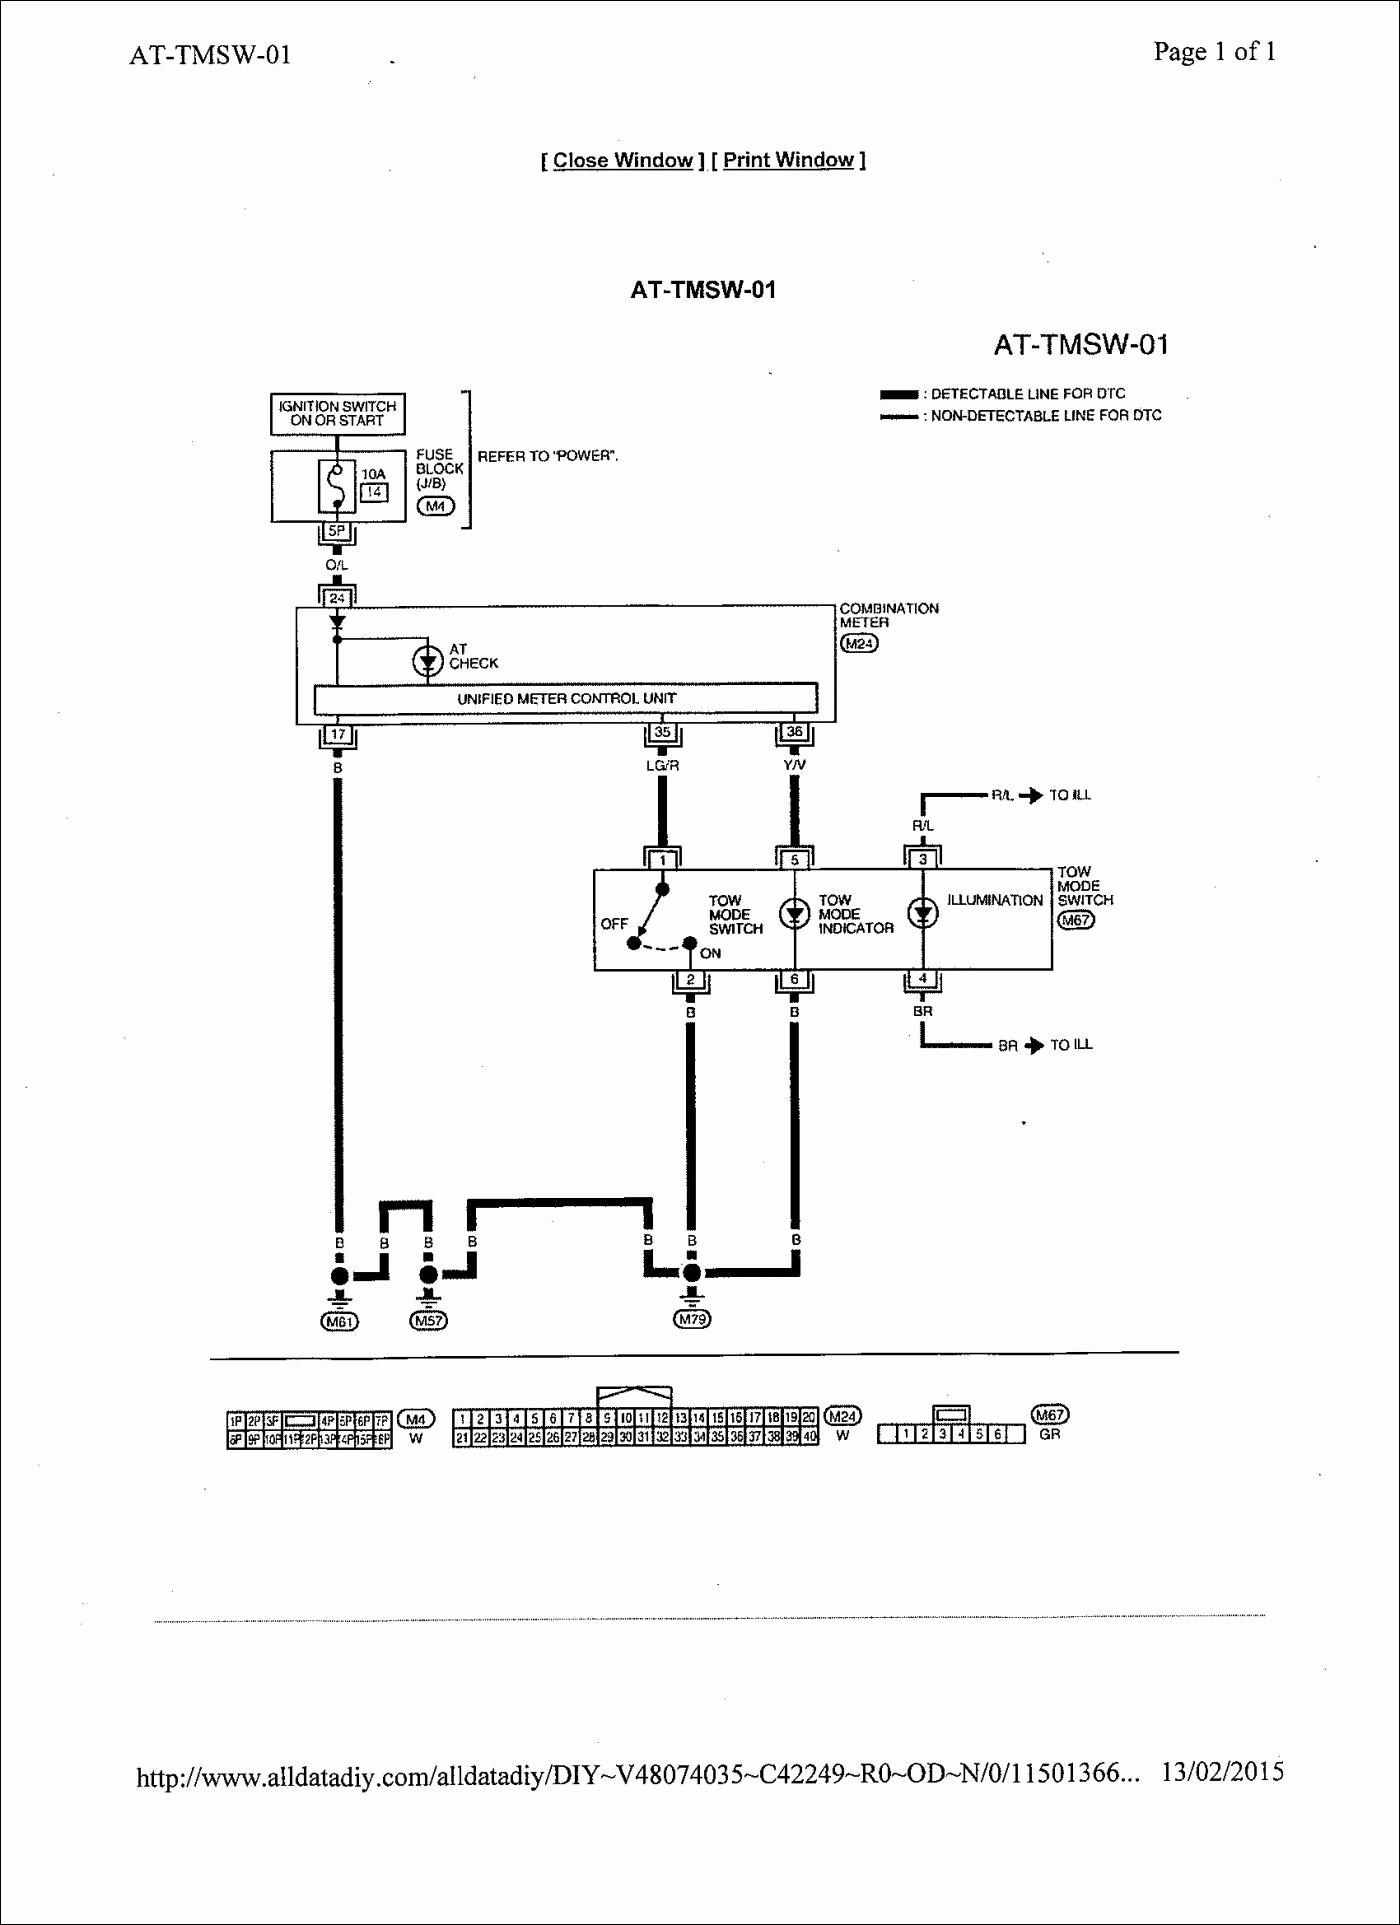 Dish Network Satellite Wiring Diagram Awesome Dish Connections Dtc Diagram House Wiring Diagram Symbols •